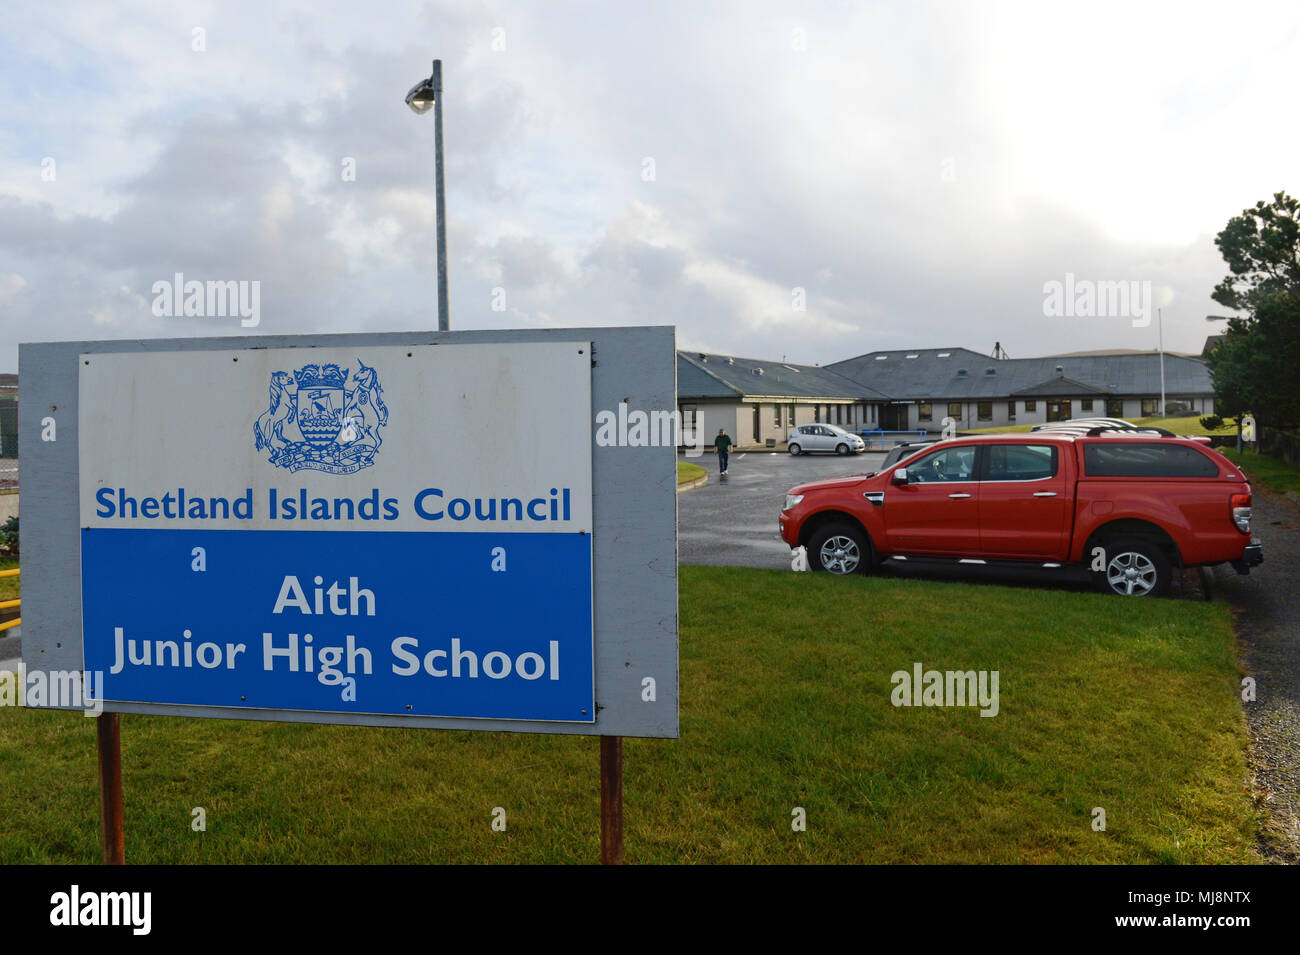 Aith Junior High School on the Shetland Islands - Stock Image